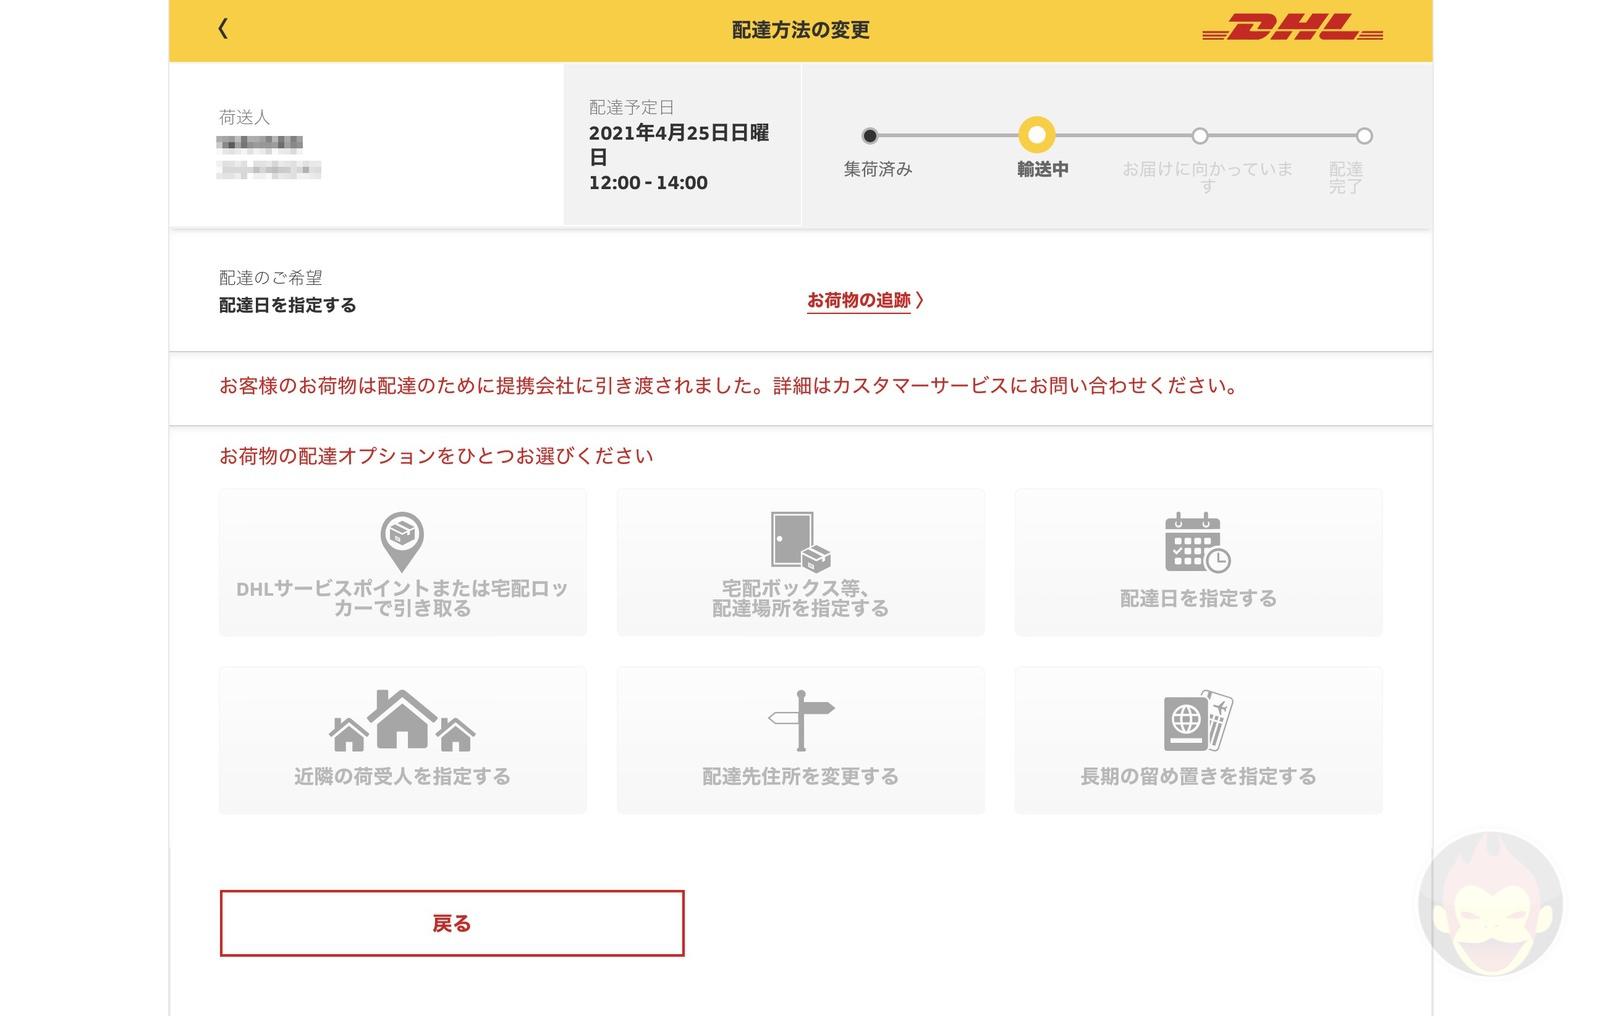 DHL shipment options 03